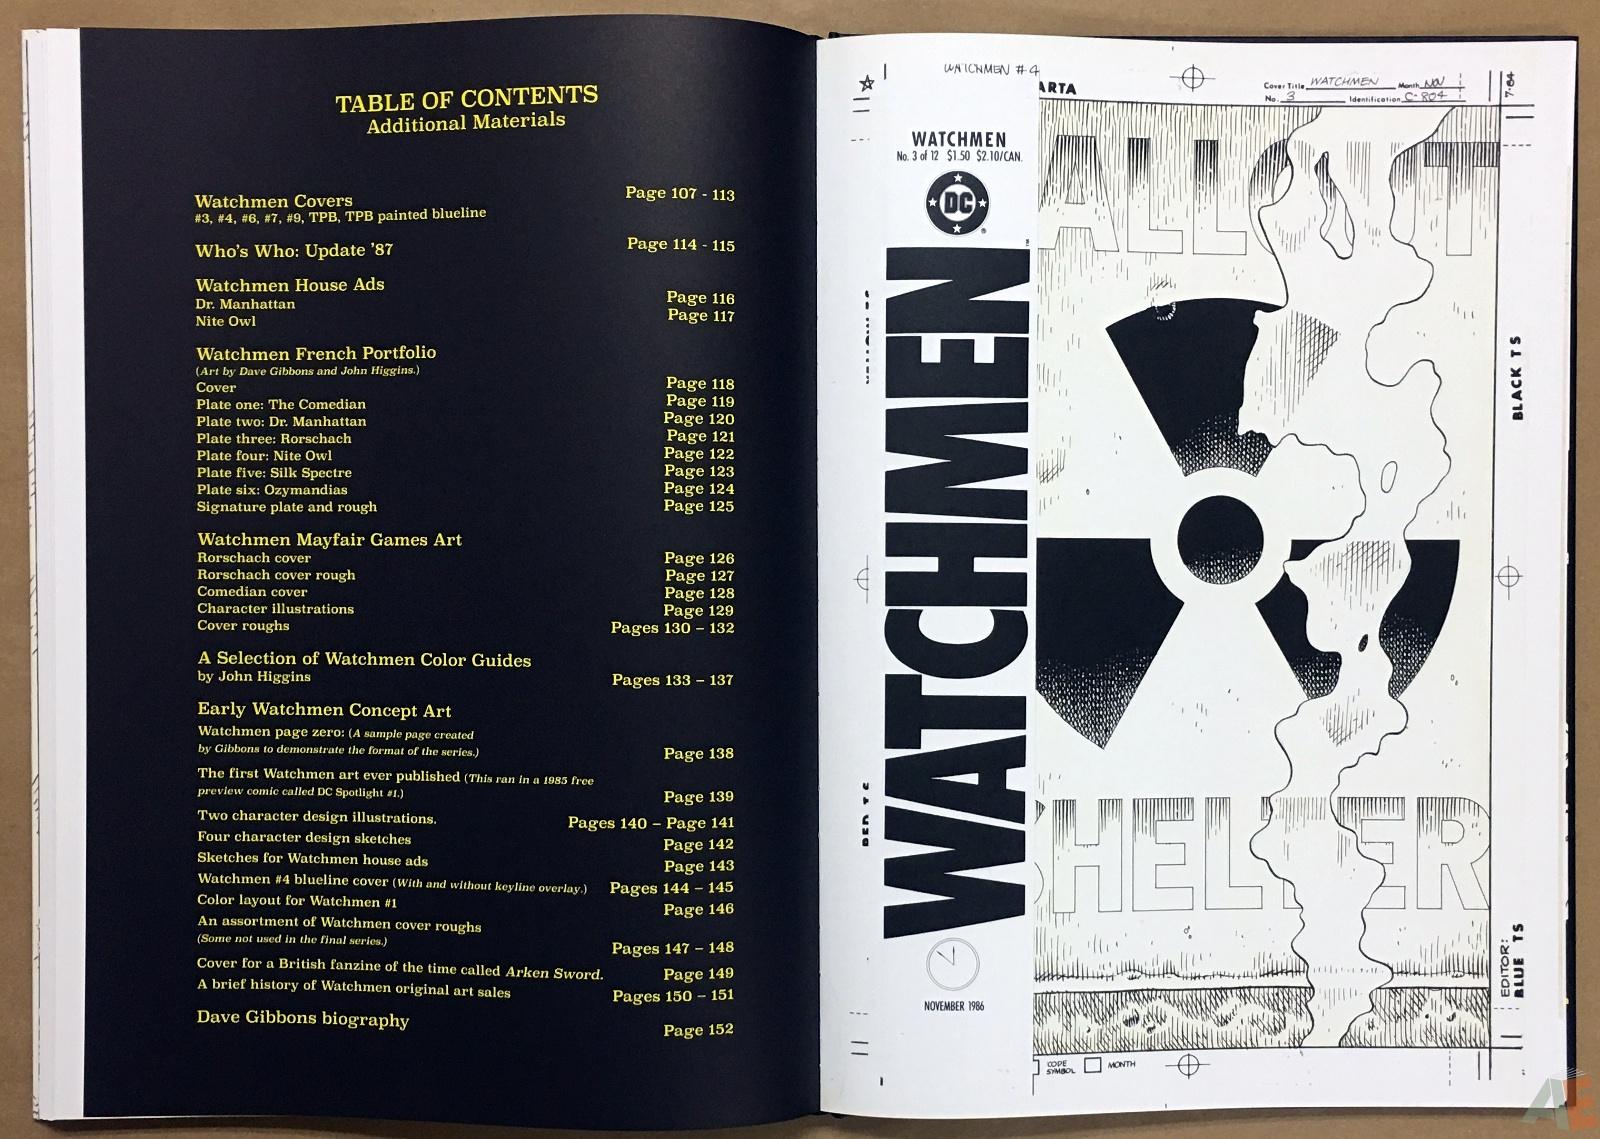 Dave Gibbons Watchmen Artifact Edition 34